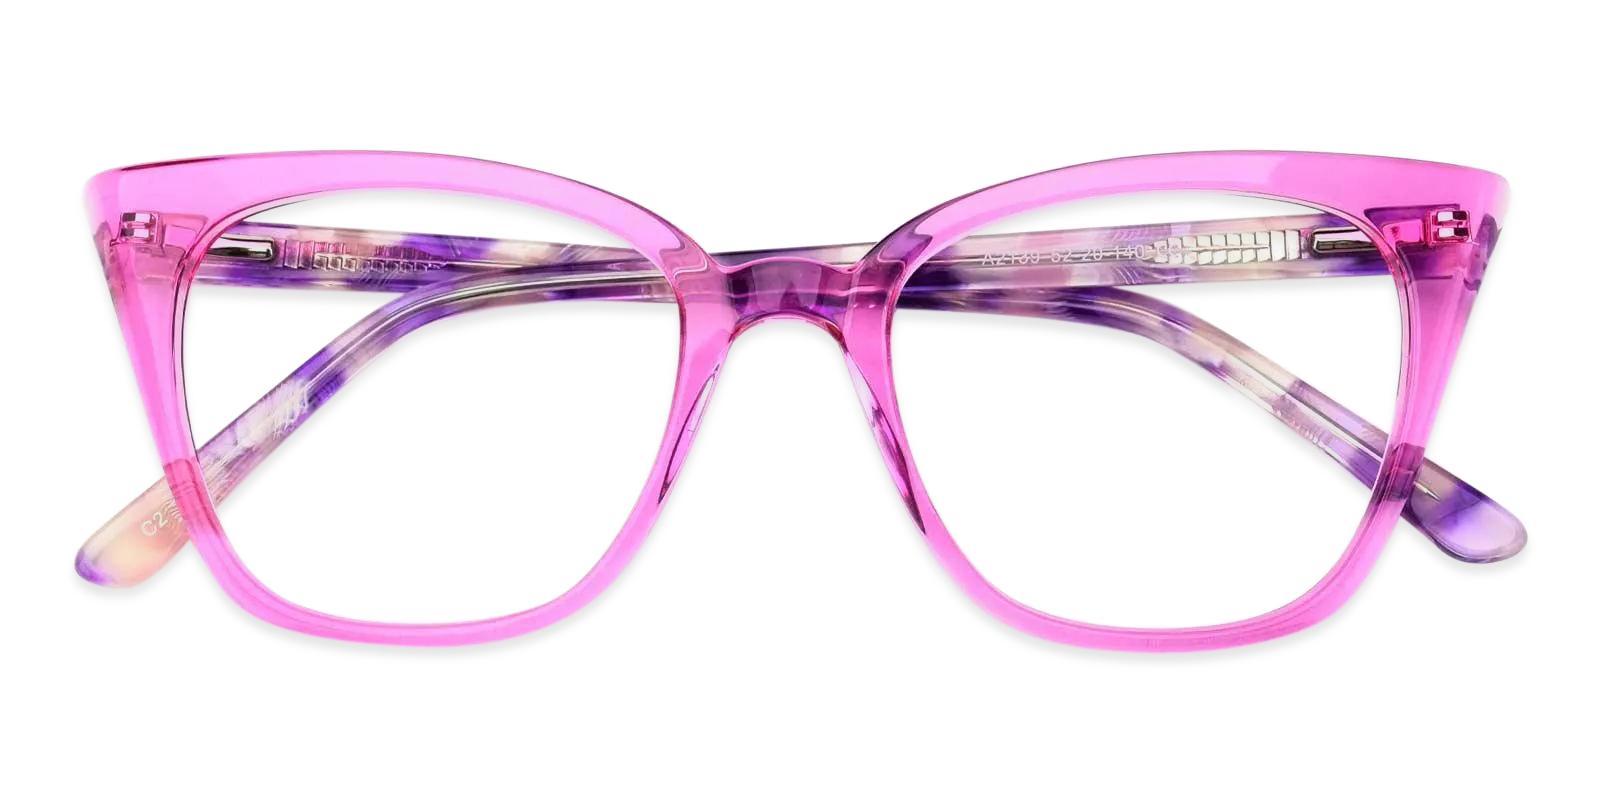 Colman Purple Acetate Eyeglasses , Fashion , SpringHinges , UniversalBridgeFit Frames from ABBE Glasses